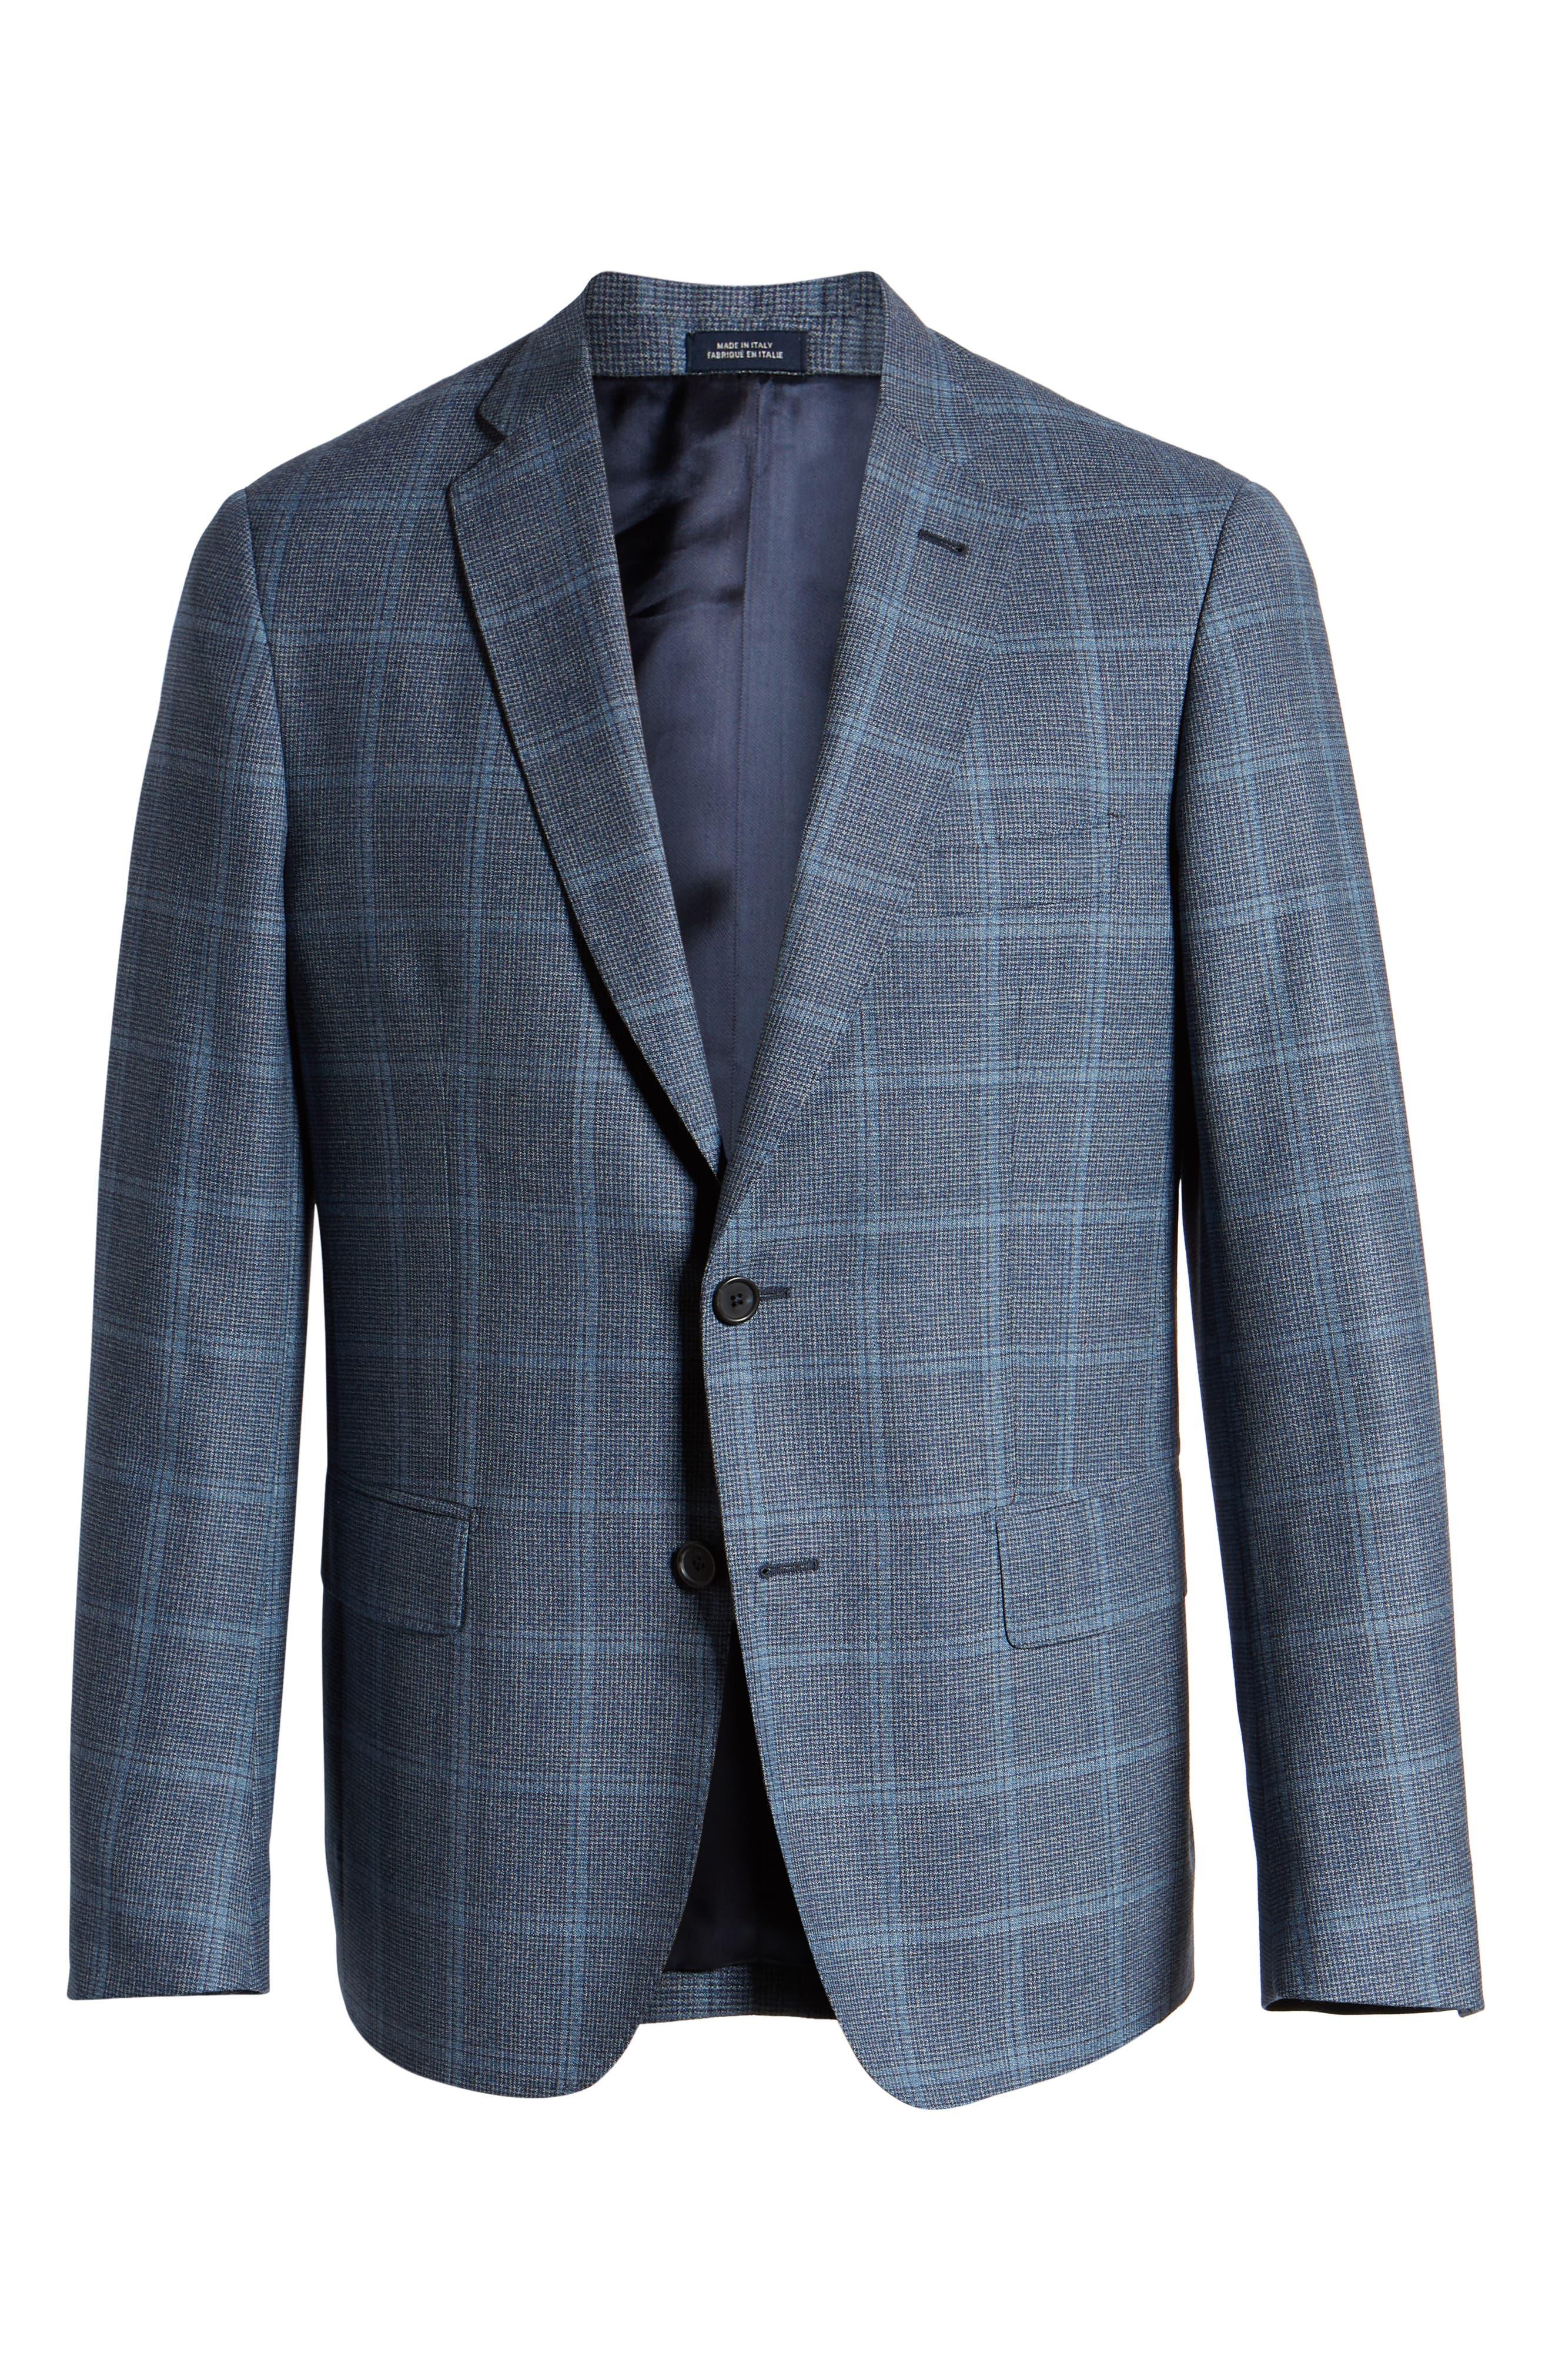 JOHN W. NORDSTROM<SUP>®</SUP>, Traditional Fit Windowpane Wool Sport Coat, Alternate thumbnail 6, color, BLUE DARK NAVY WINDOWPANE